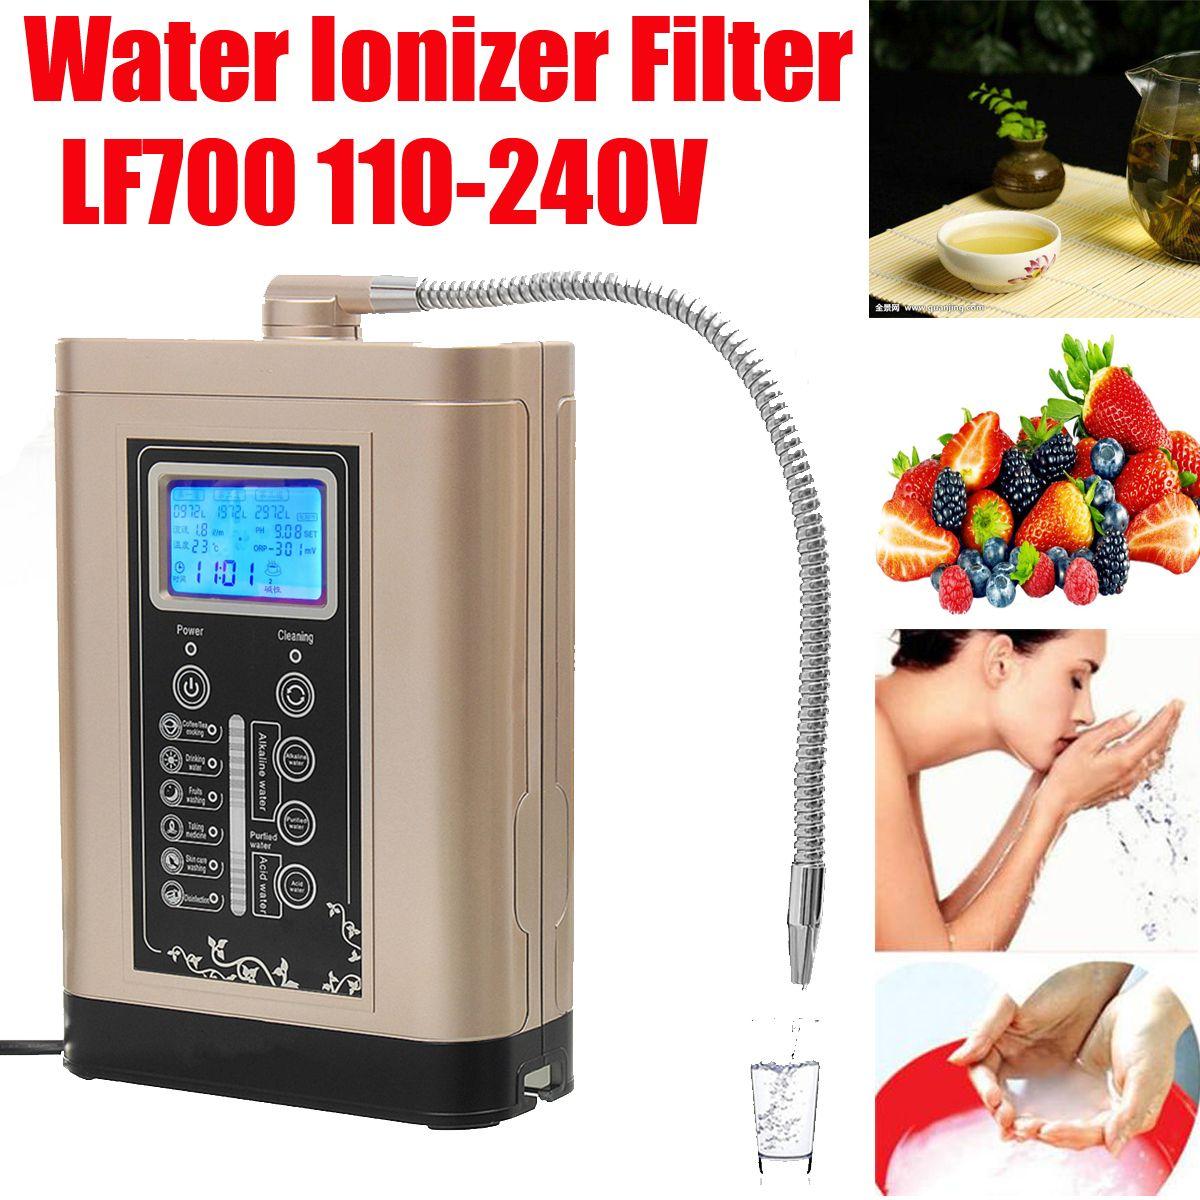 110-240V Steel LF700 Water Ionizer Purifier LCD Tou.ch Control Alkaline Acid PH Adjust Machine AU/US/EU Plug